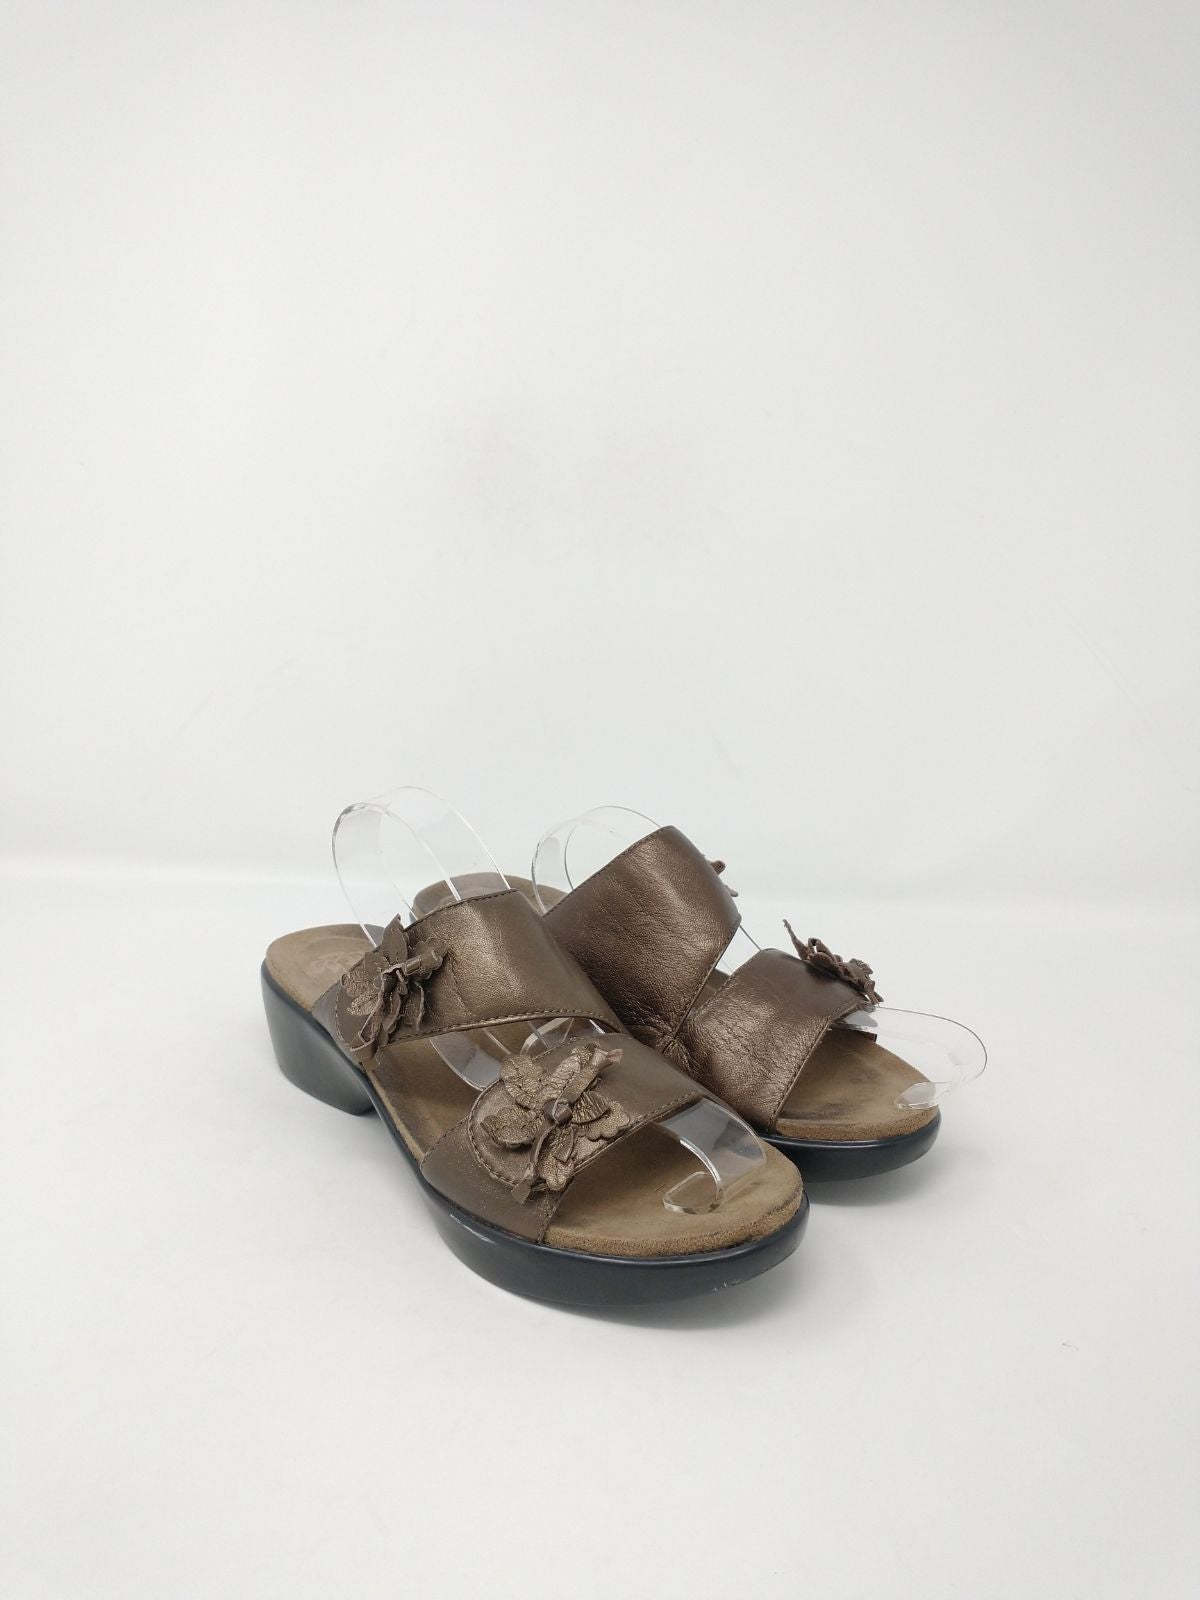 Dansko Bronze Leather Sandals EU 38